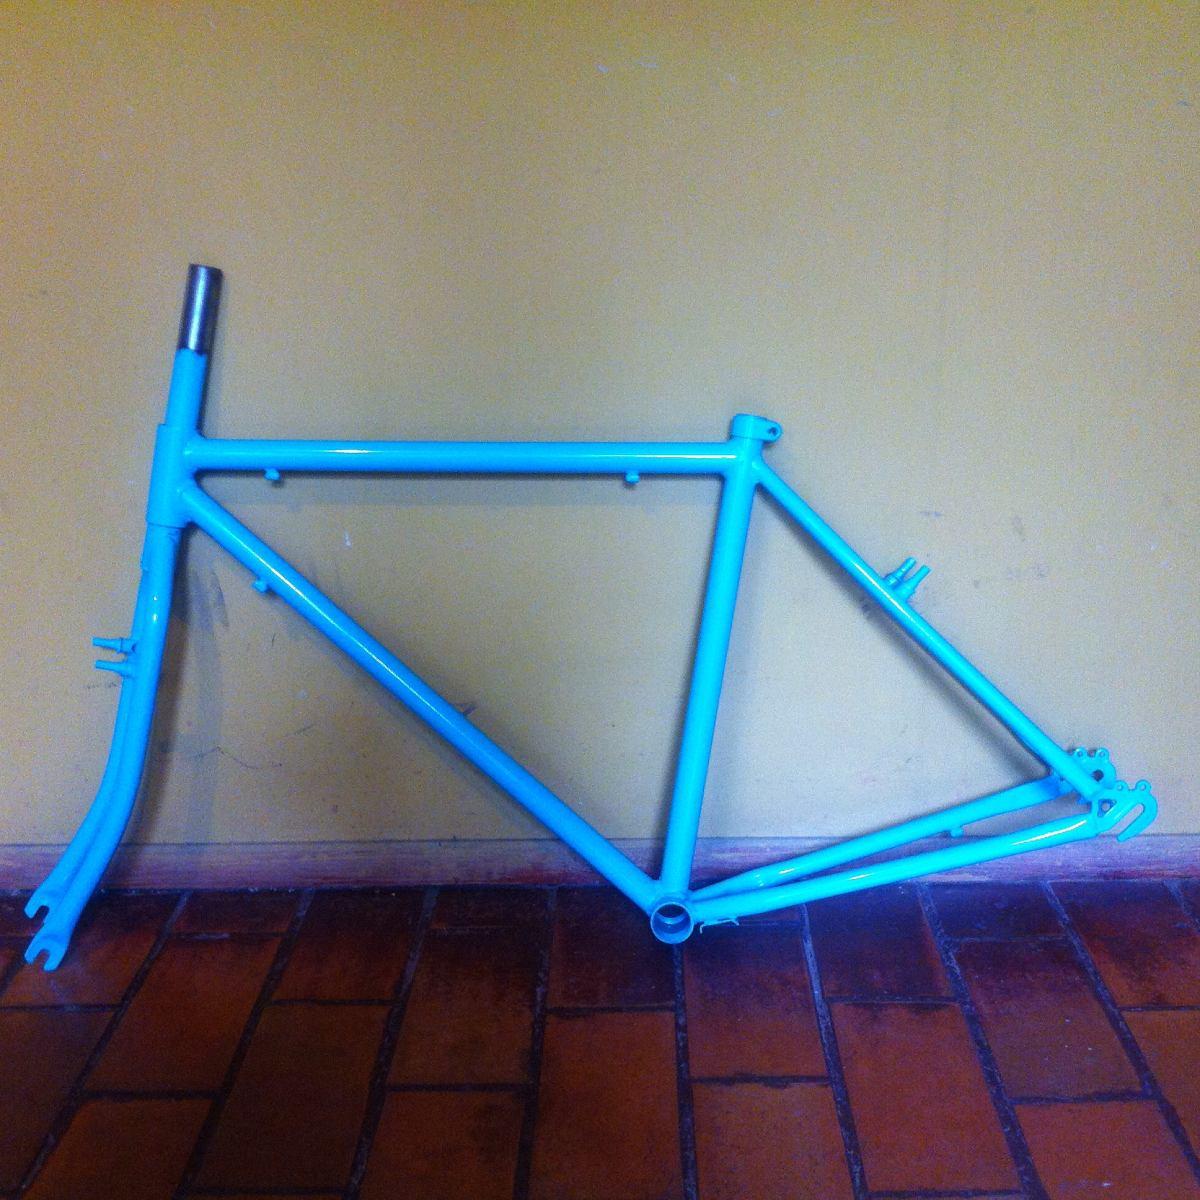 Marco Cuadro Bicicleta Acero Talla 50 Gravel Ciclocross Ruta ...